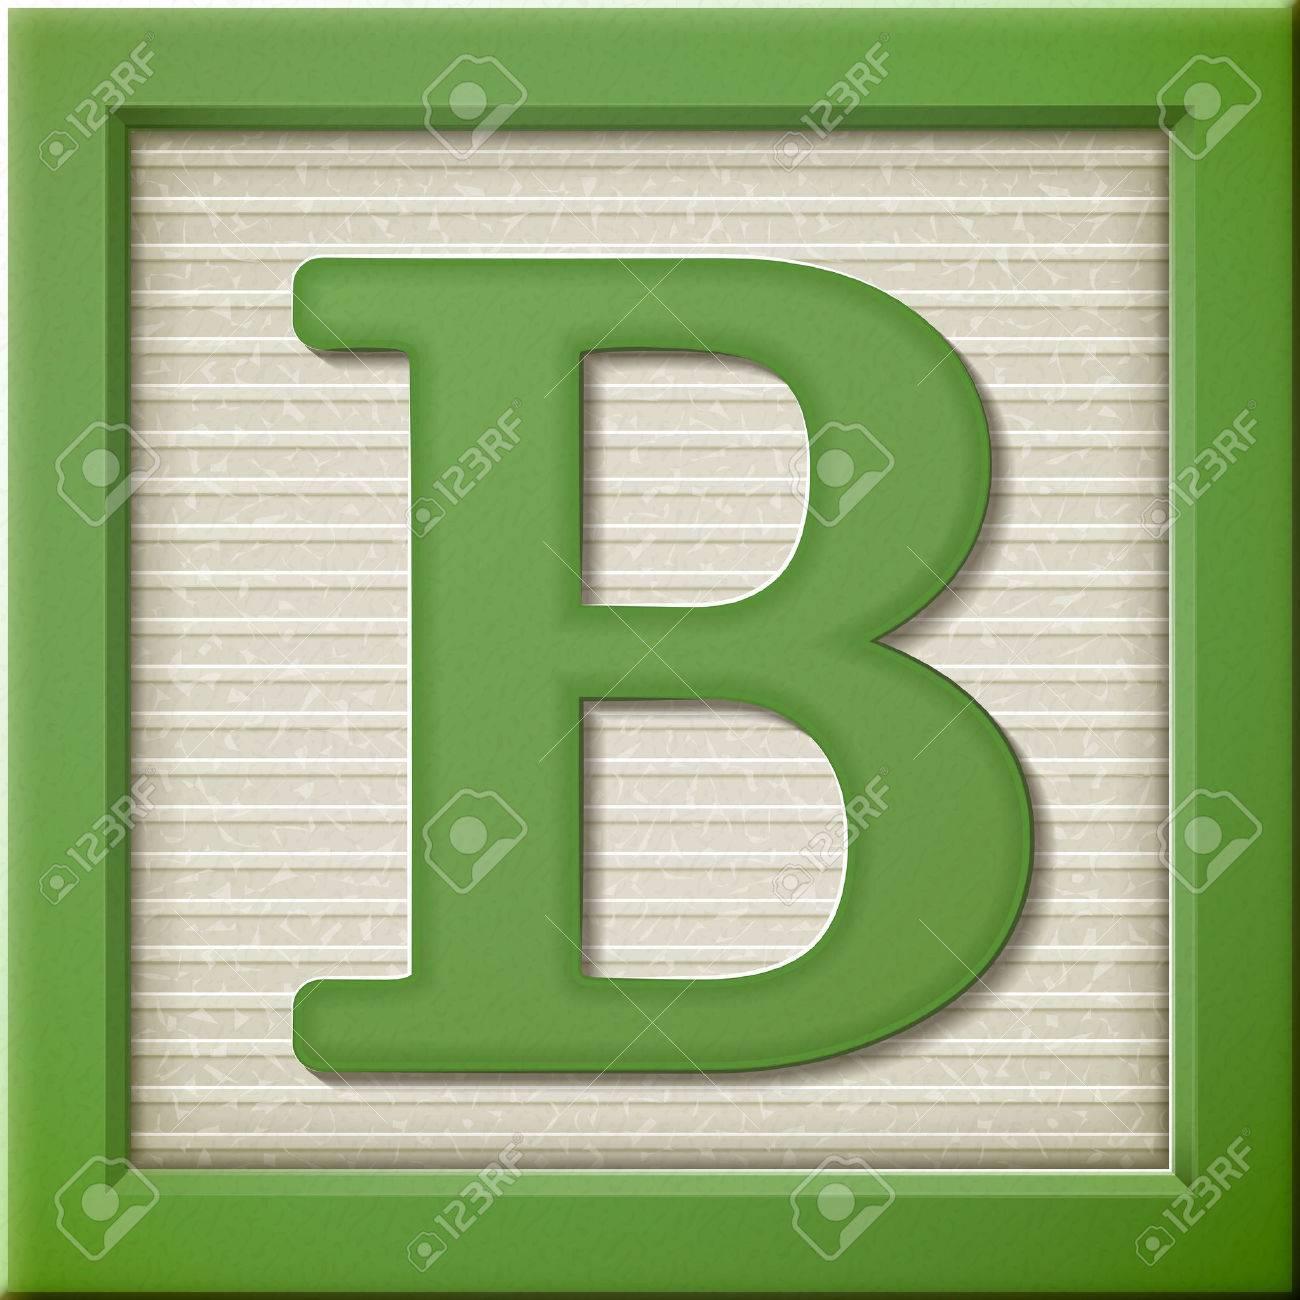 close up look at 3d green letter block B.